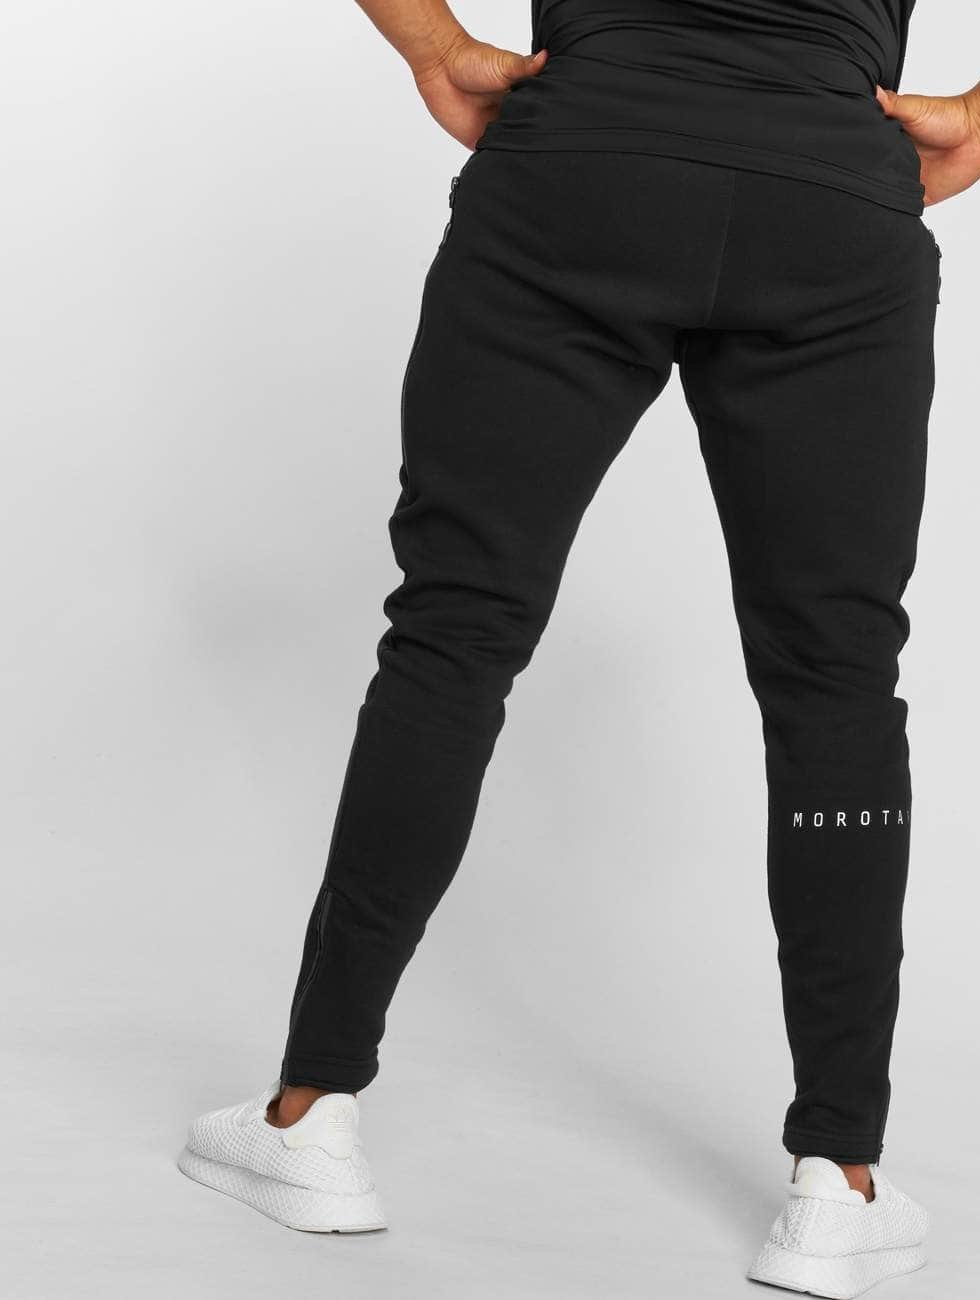 MOROTAI Sweat Pant Neotech black